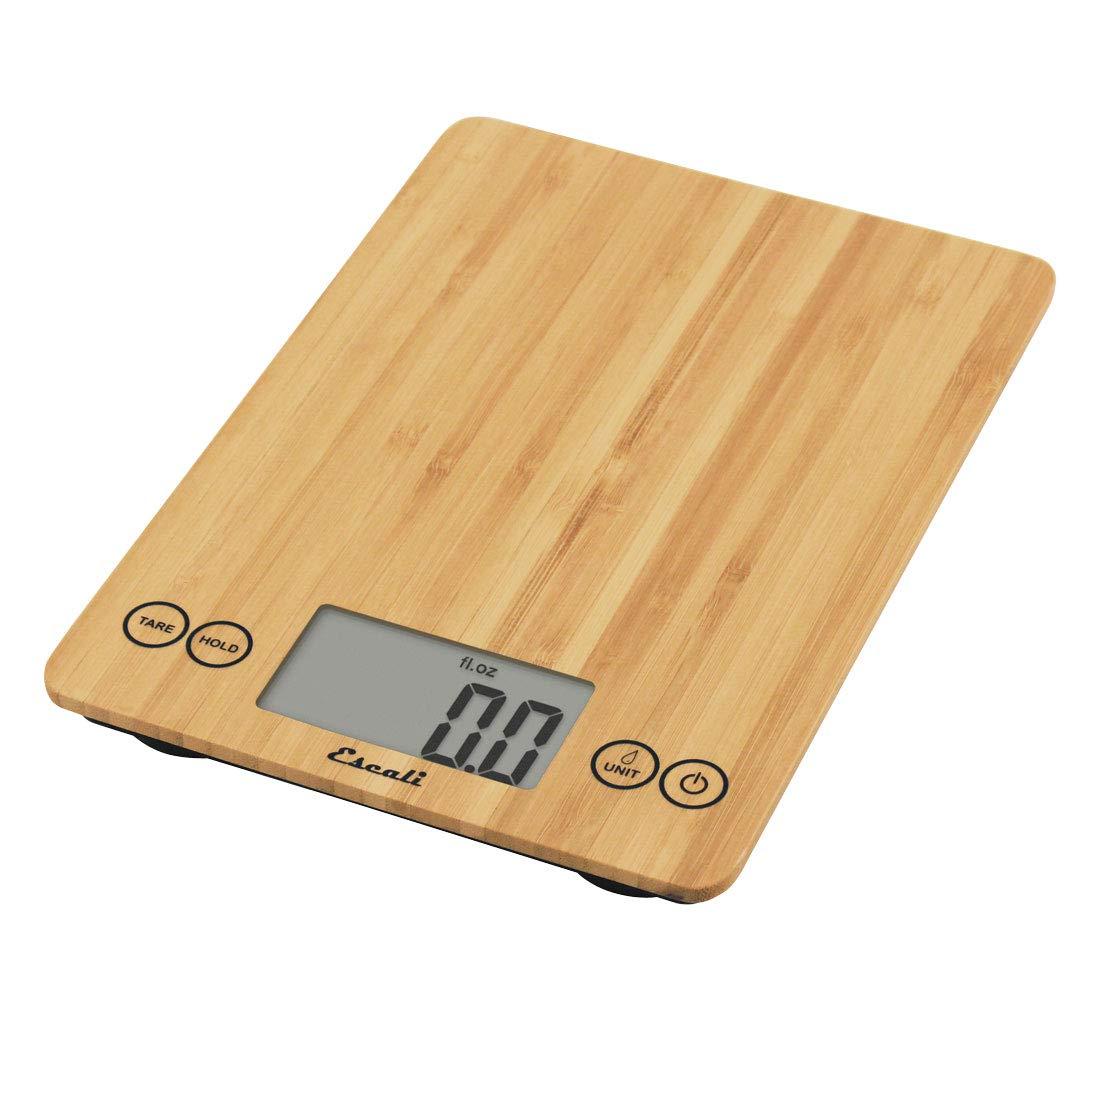 Escali ECO157 Arti Digital Kitchen Scale 15Lb/7Kg, Bamboo, 7 kg, Natural